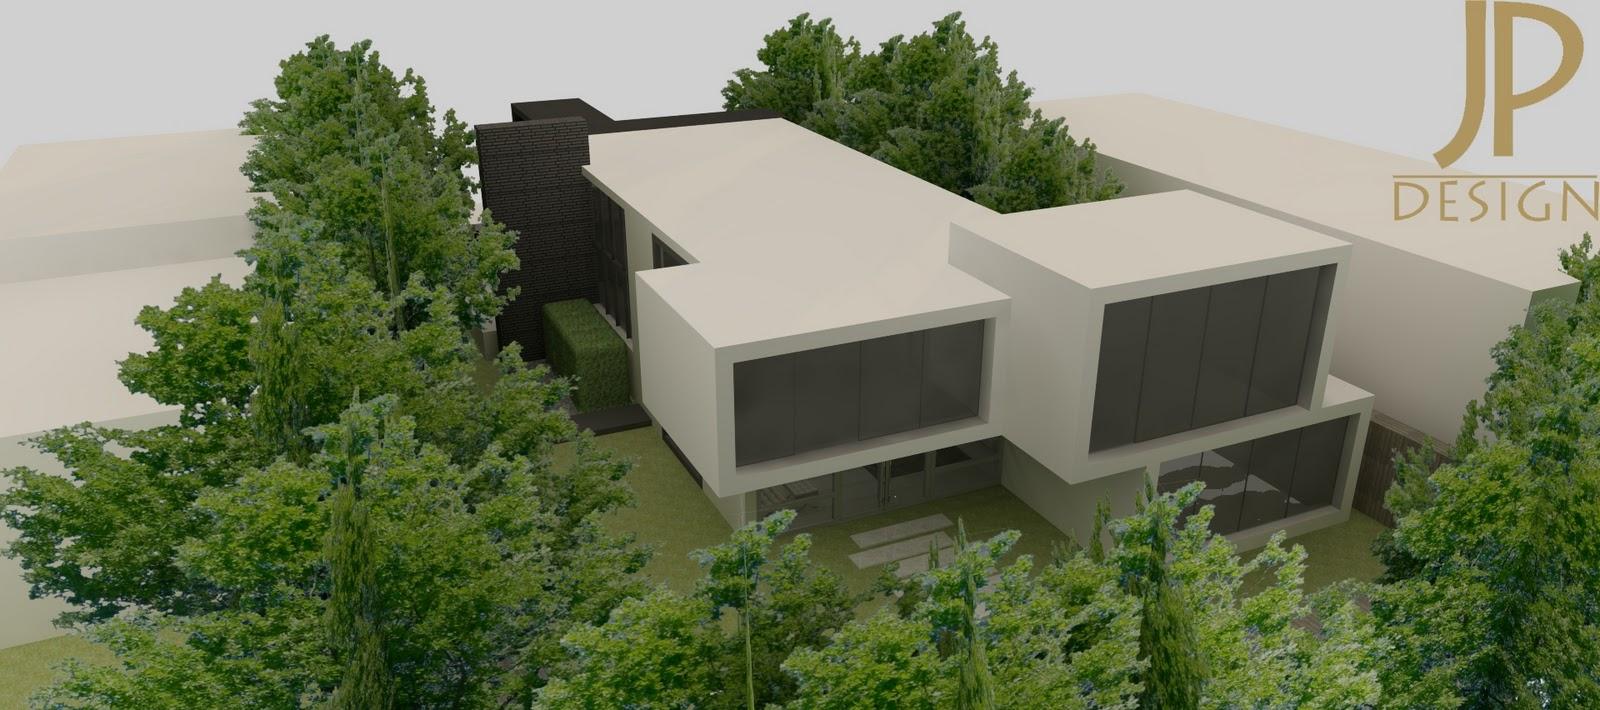 joseph plata small modern japanese house. Black Bedroom Furniture Sets. Home Design Ideas